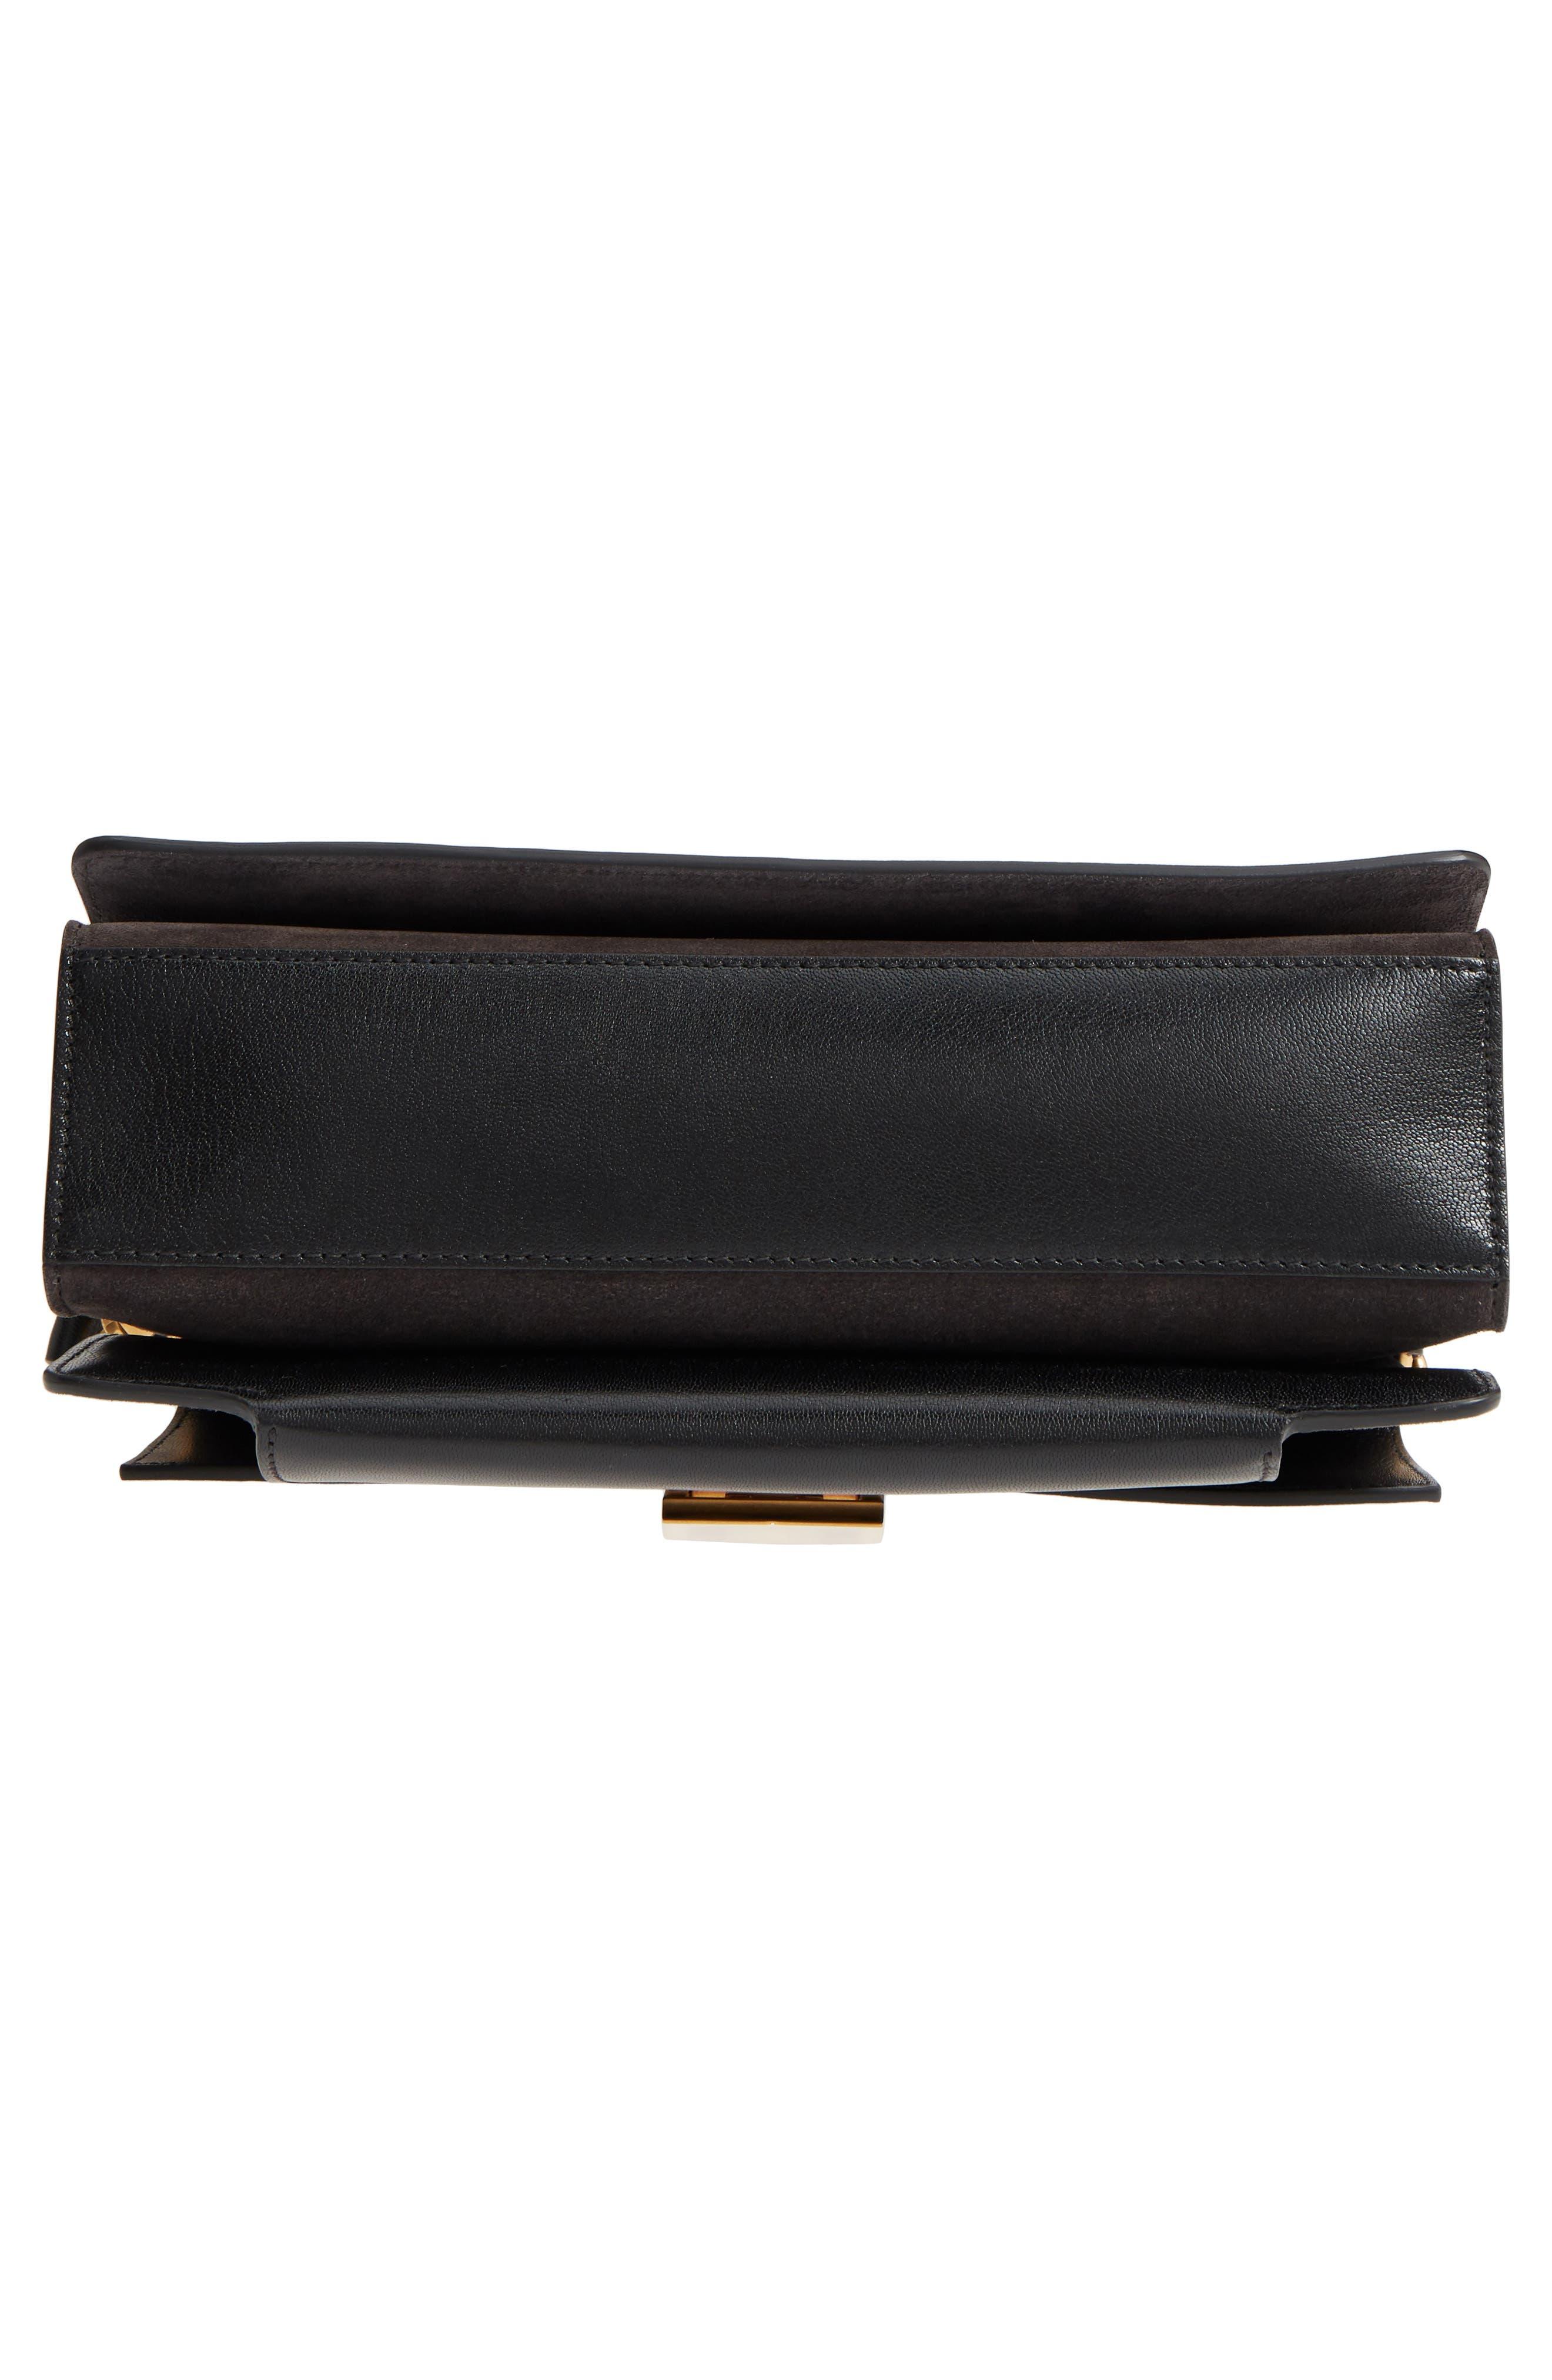 Medium GV3 Leather Crossbody Bag,                             Alternate thumbnail 6, color,                             BLACK/ GREY